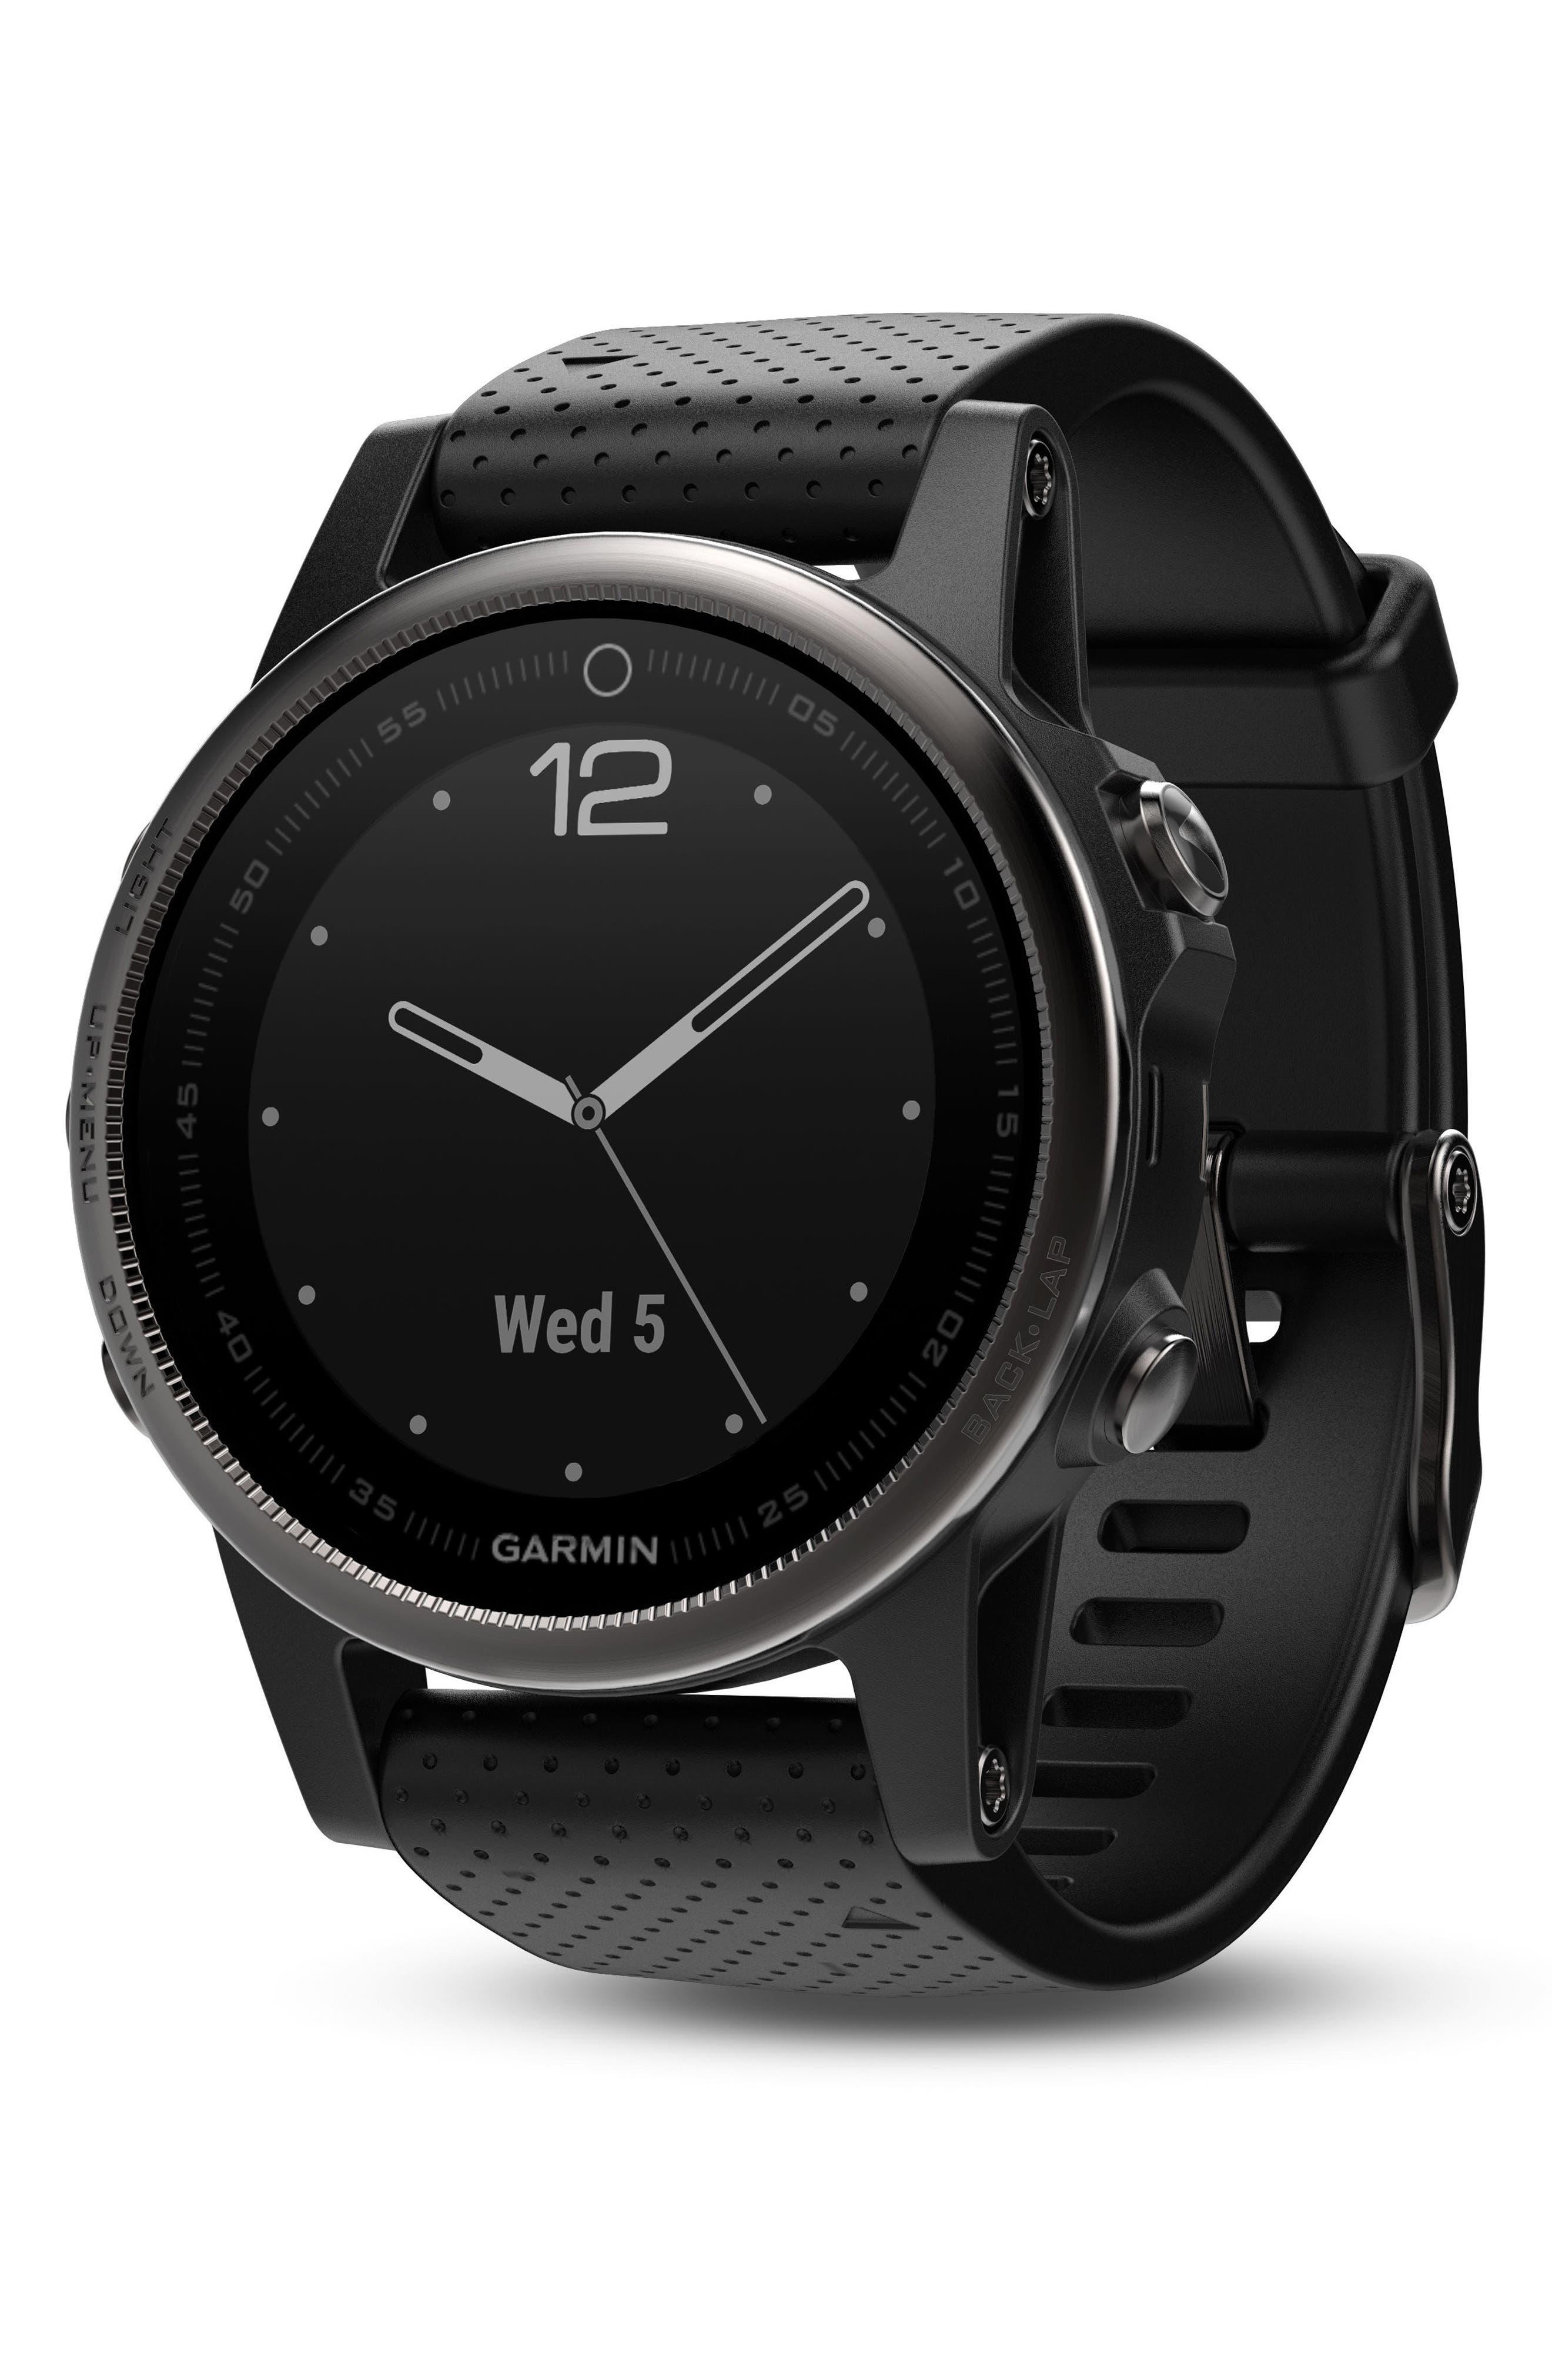 fenix<sup>®</sup> 5S Sapphire Premium Multisport GPS Watch, 42mm,                         Main,                         color, Black/ Black Sapphire